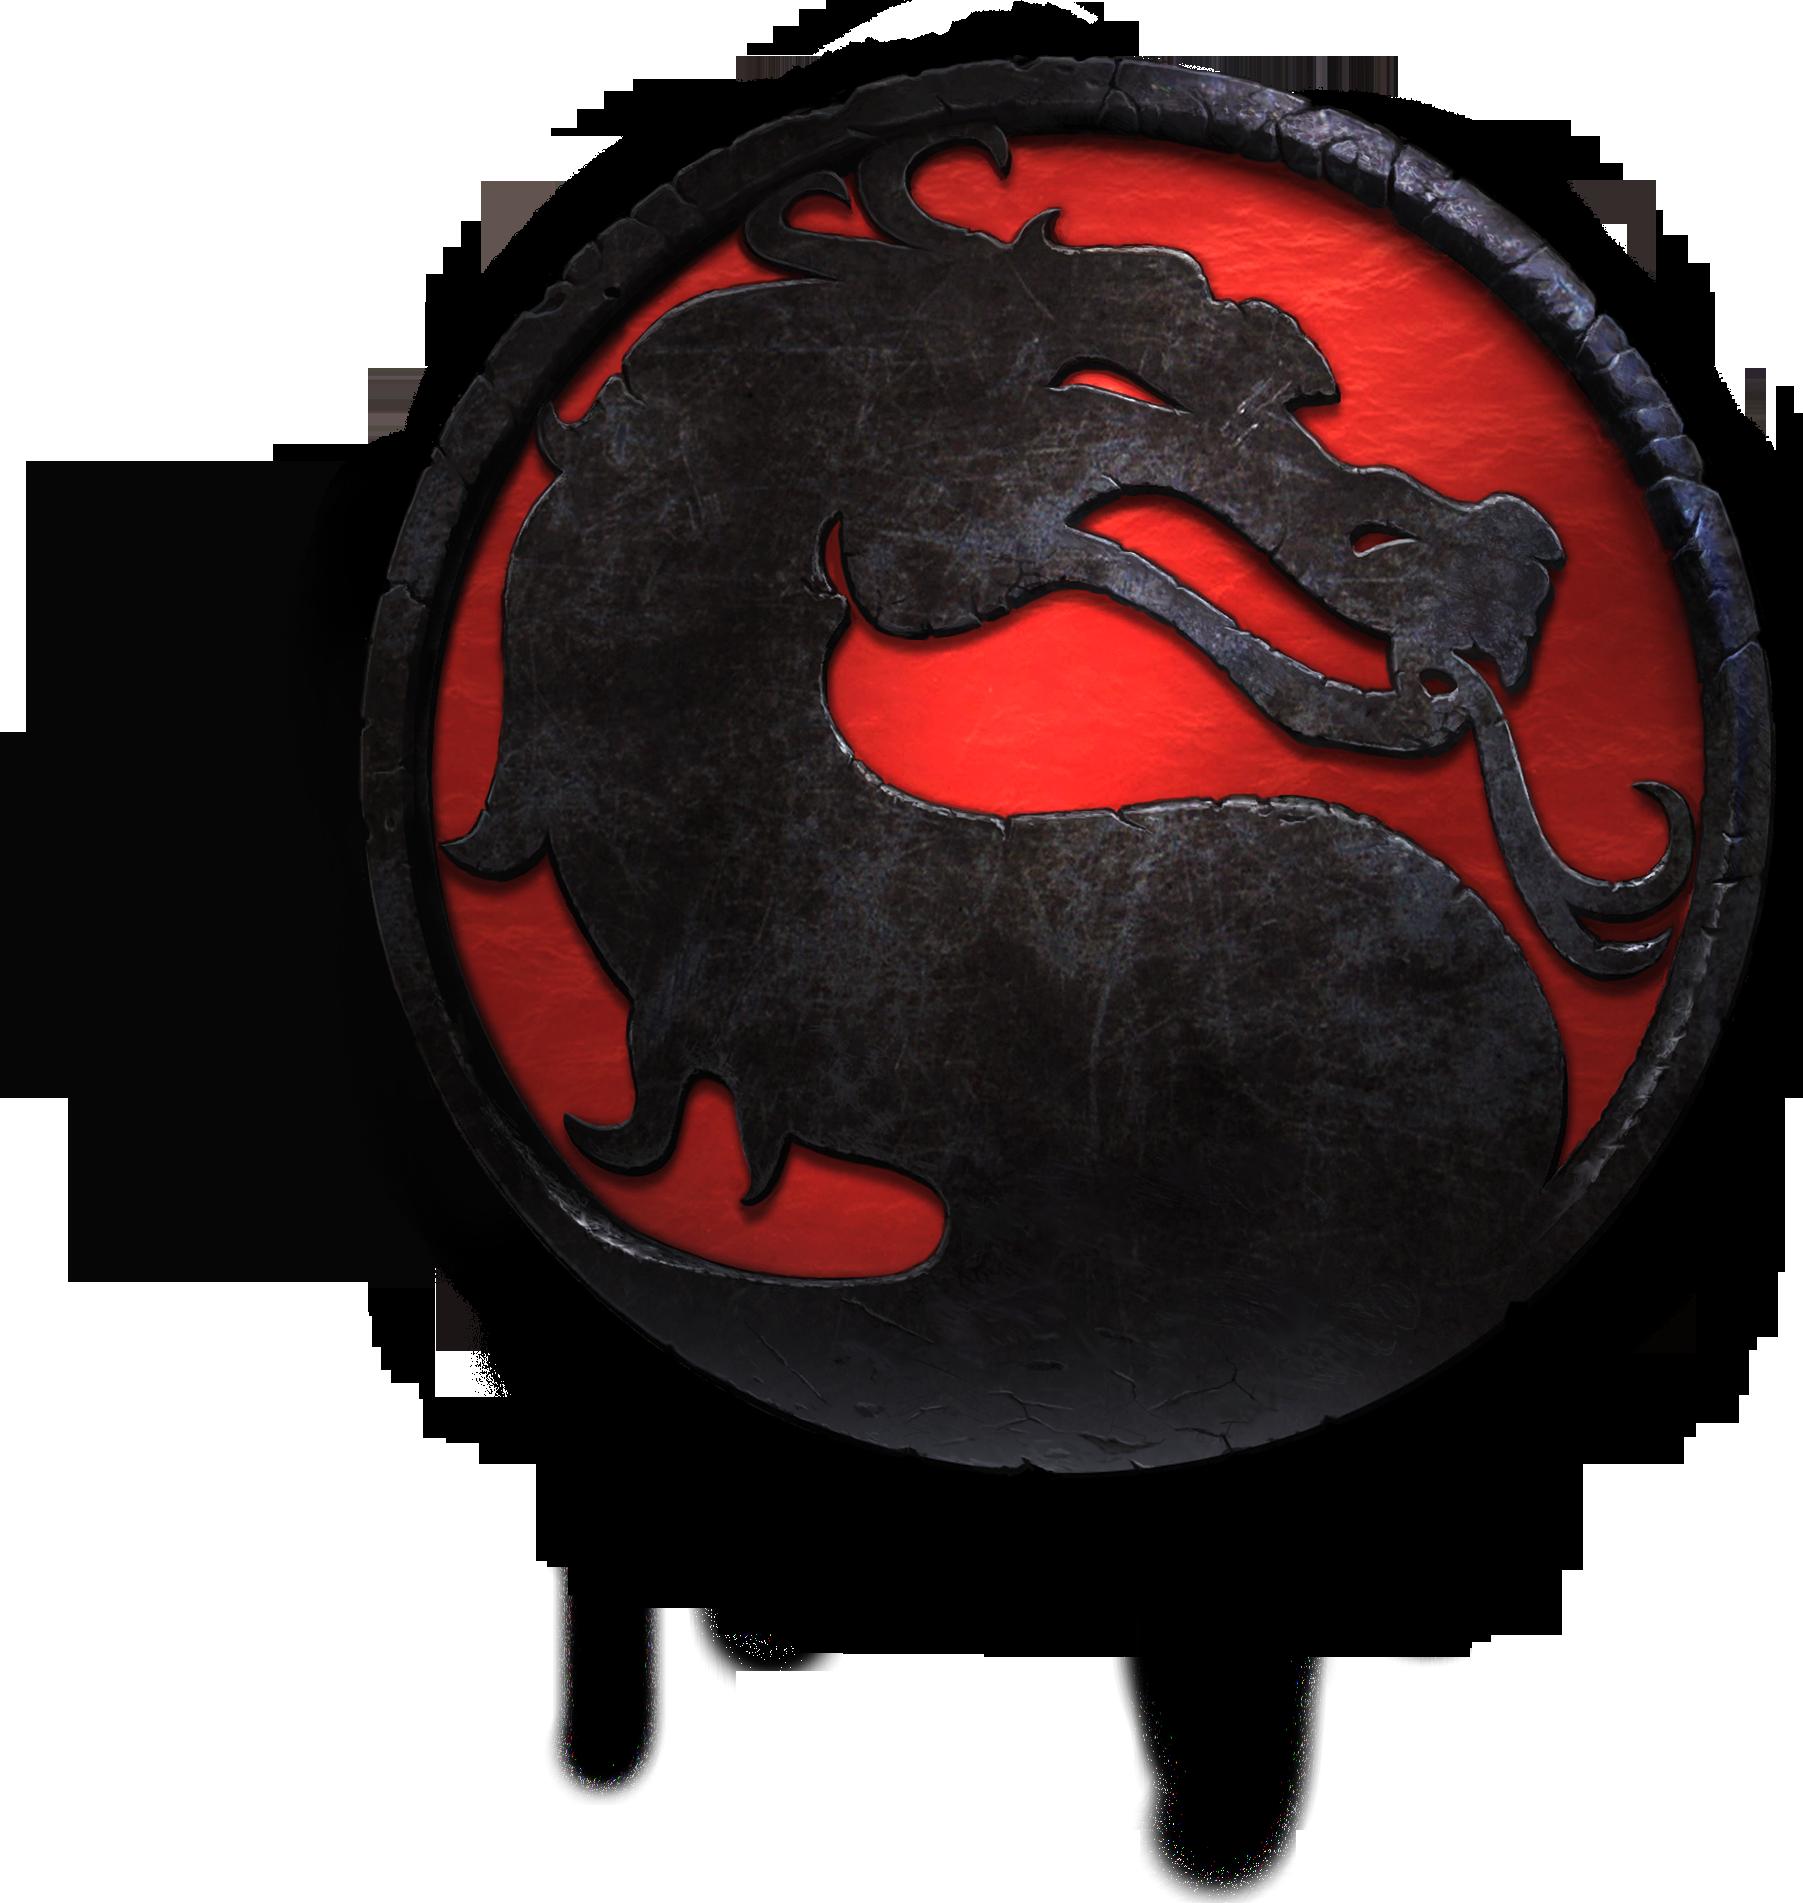 Lo que tenes que saber del Mortal Kombat parte 4